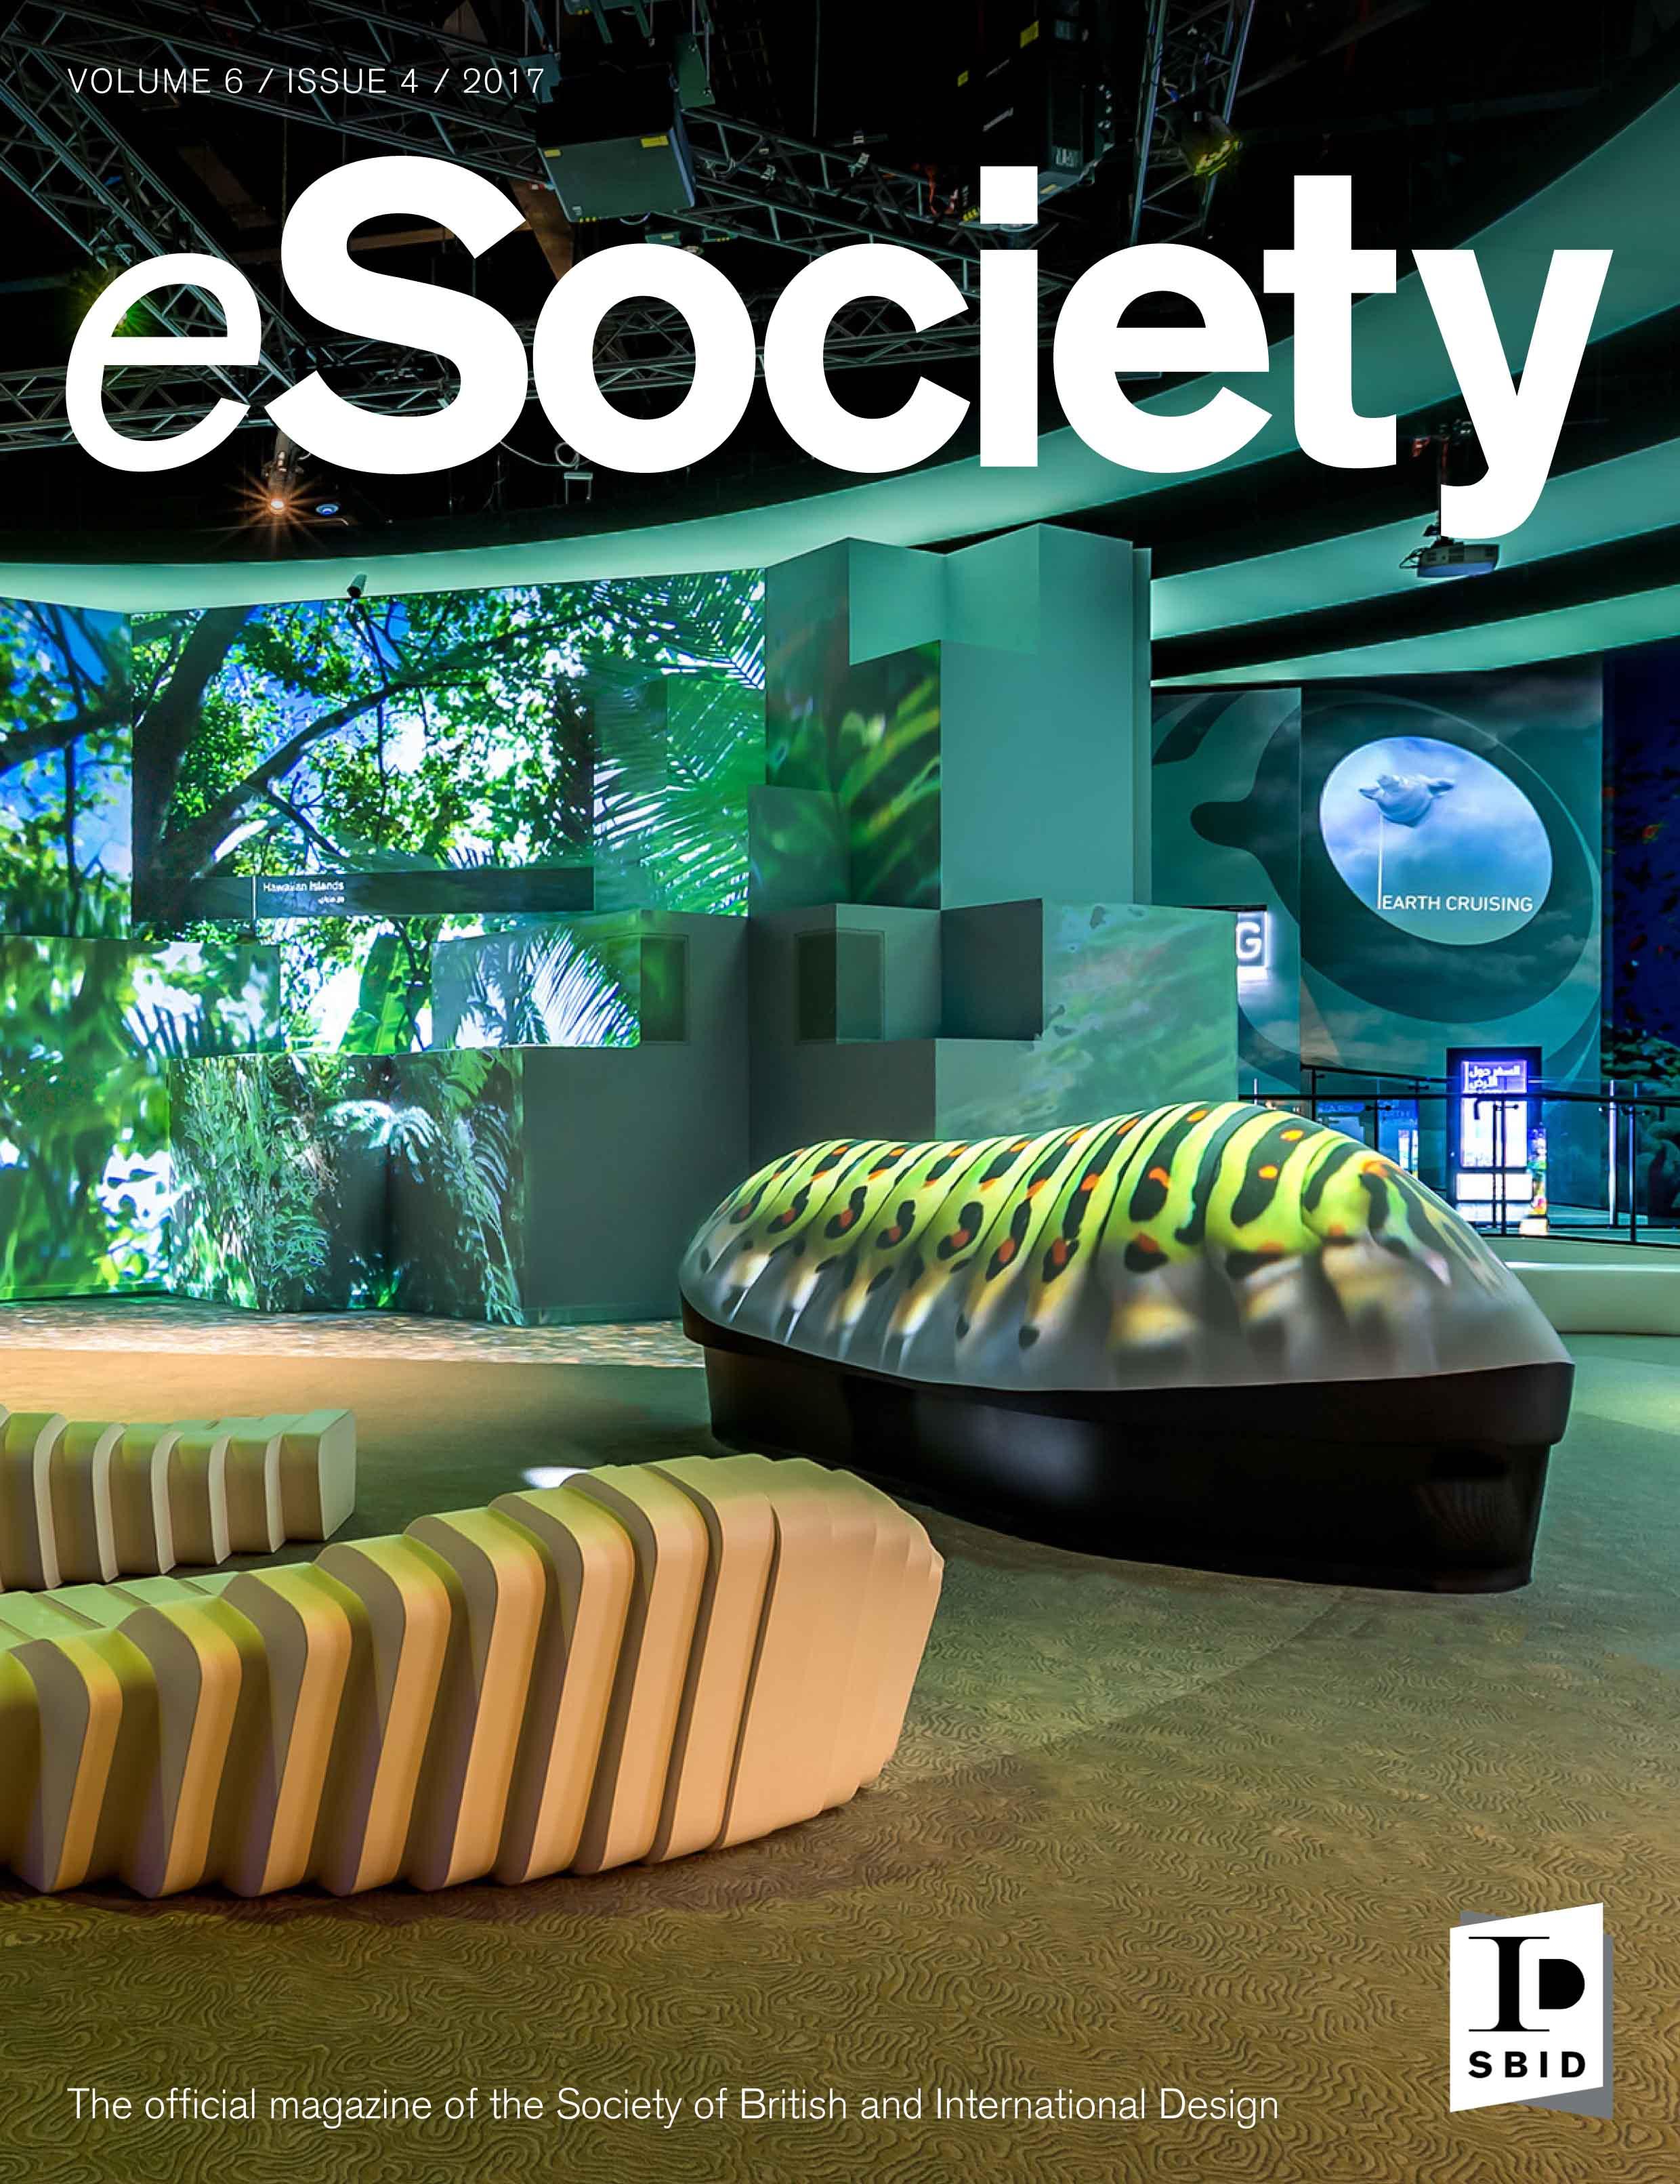 SBID interior design magazine, eSociety, Volume 6 Issue 4